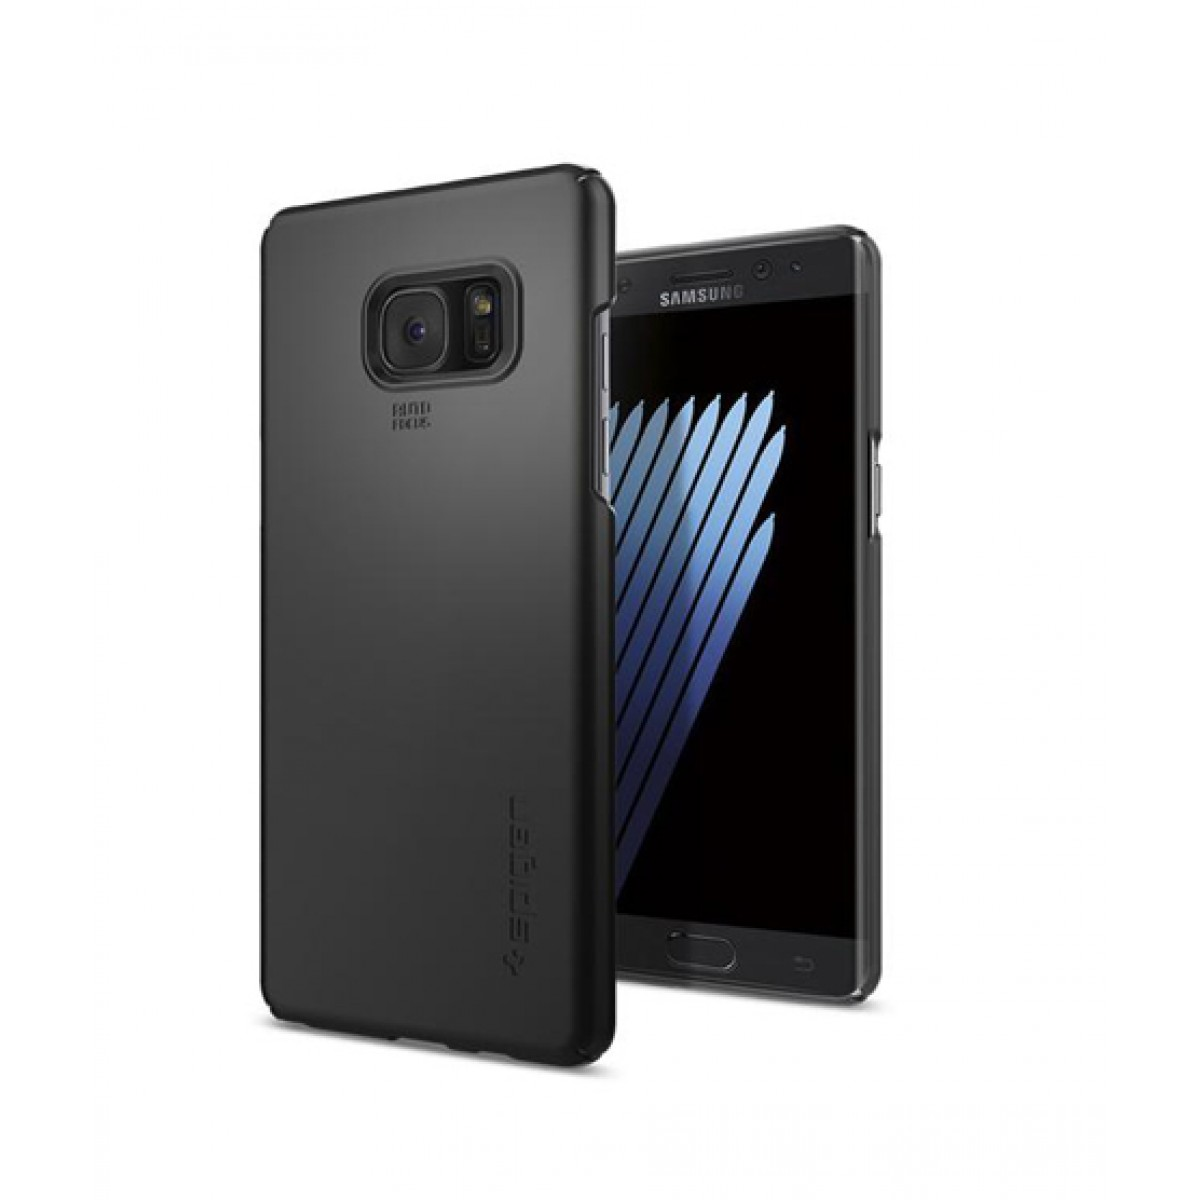 hot sale online f4471 064c4 Spigen Thin Fit Case For Galaxy Note 7